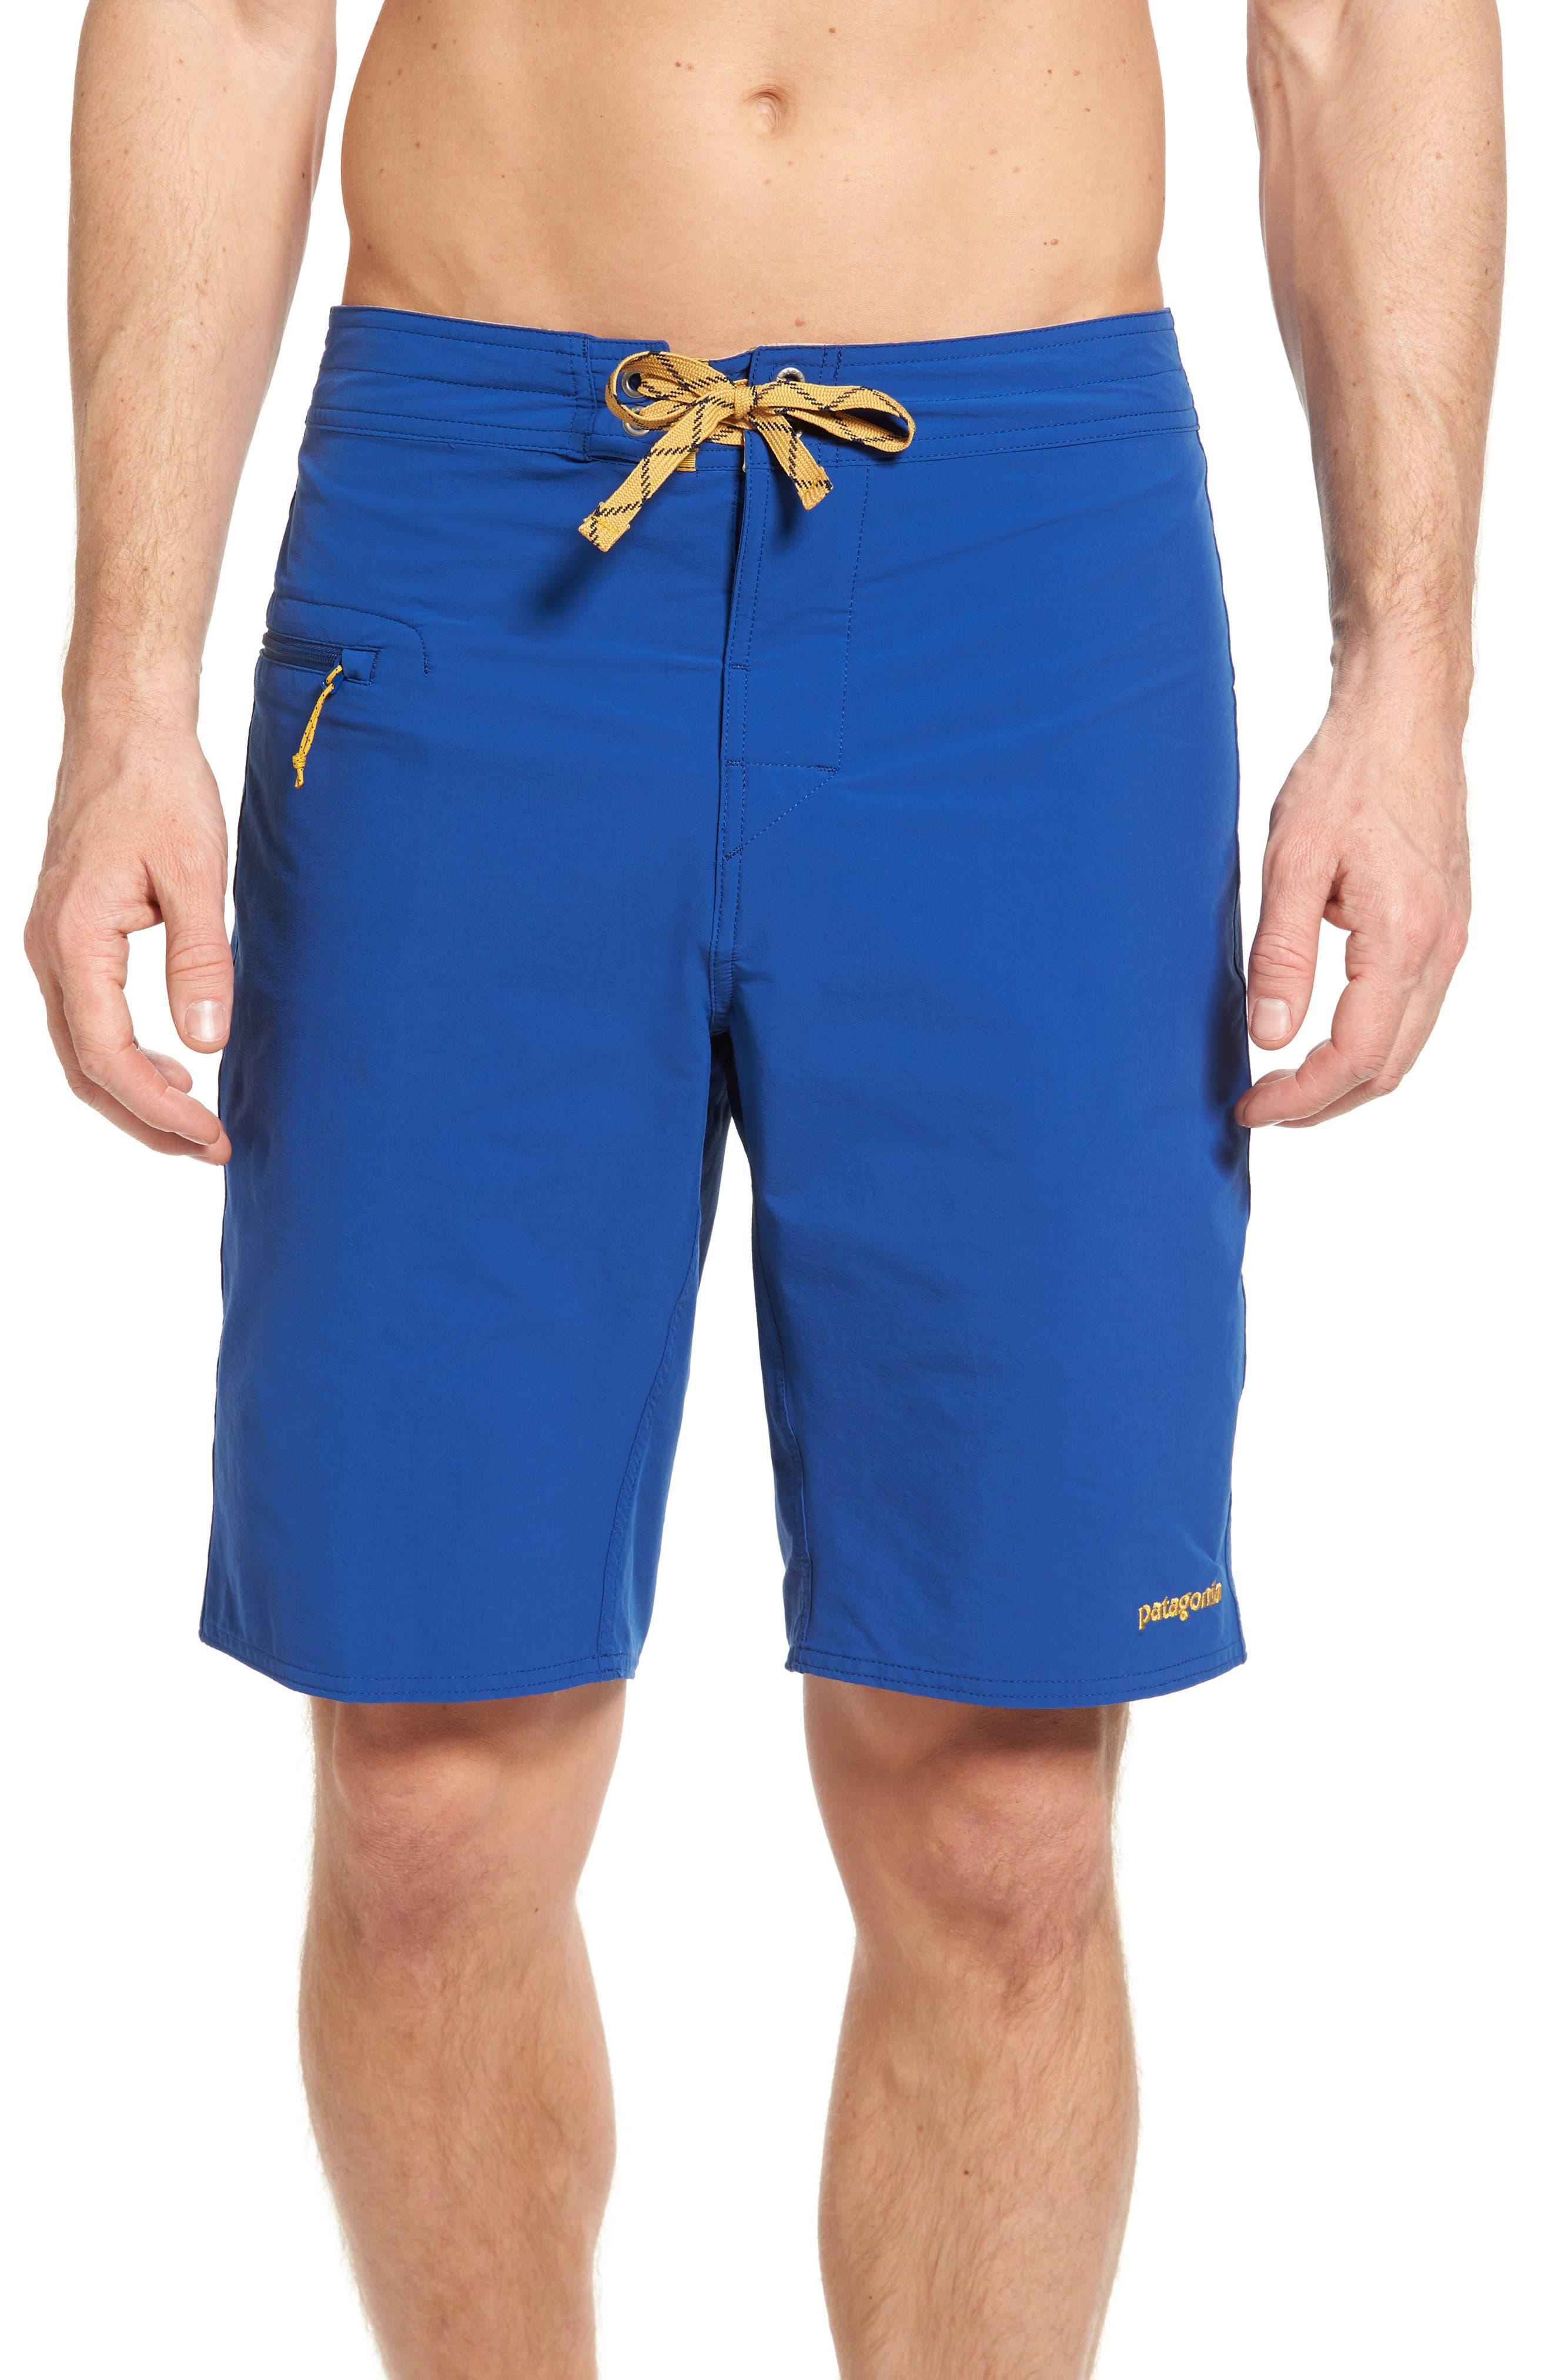 Wavefarer Board Shorts,                             Main thumbnail 1, color,                             Blue